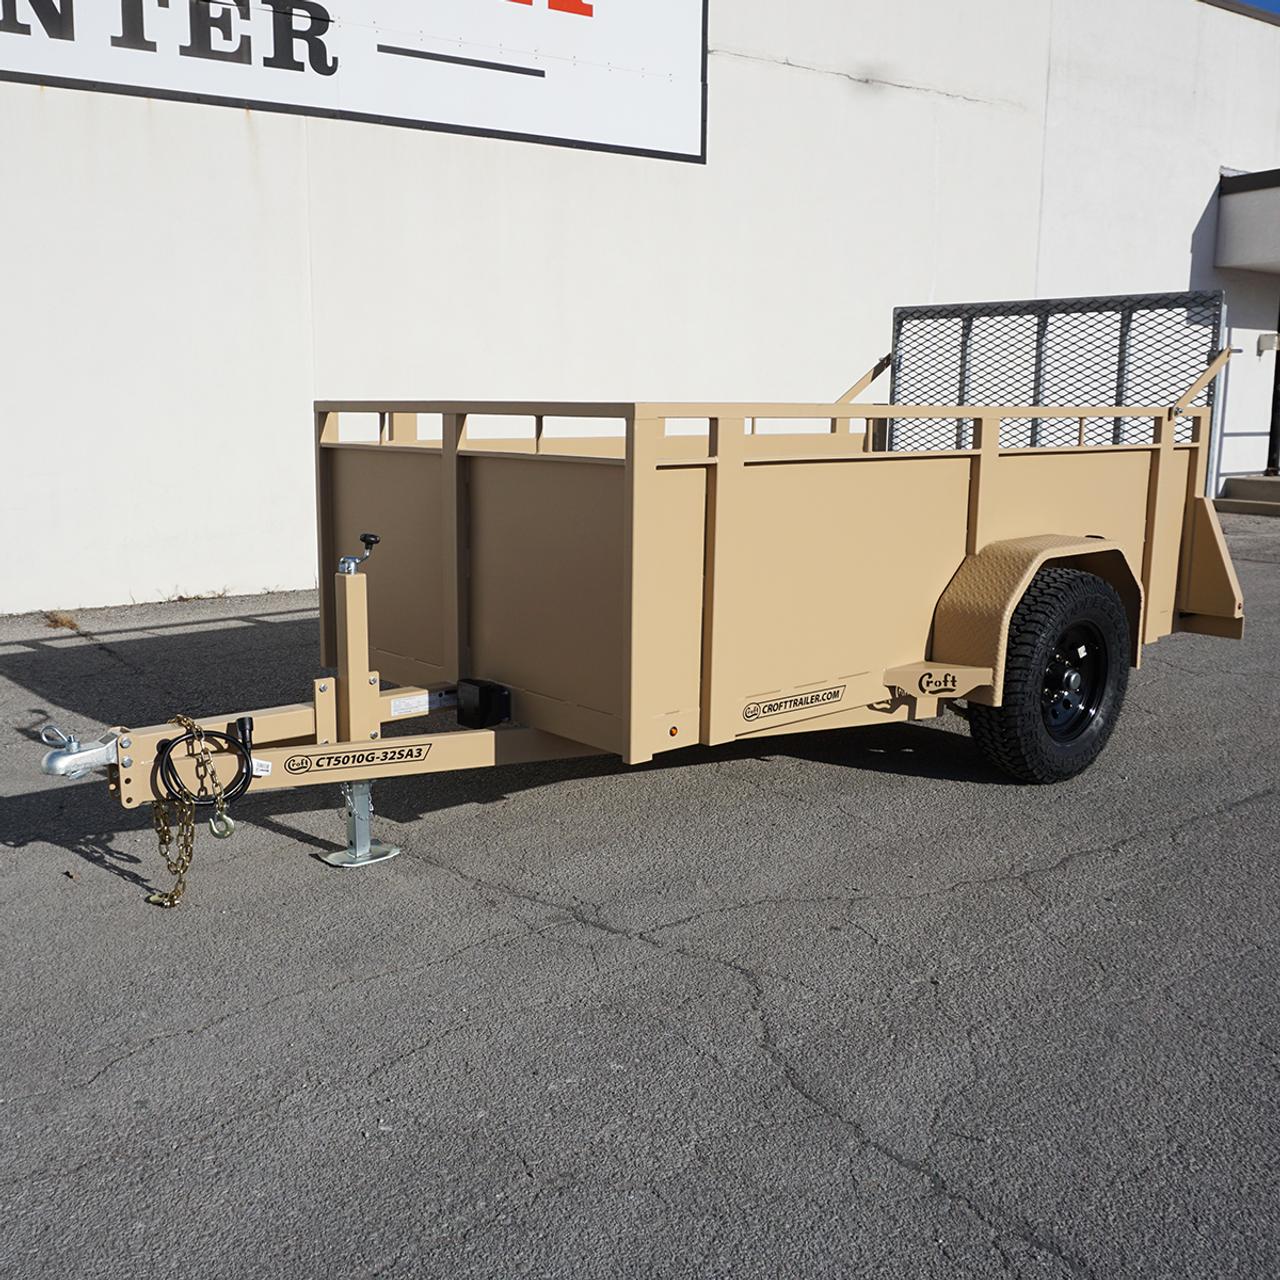 CT5010G-32SA3 --- 2021 Croft 5'x10' High Side Utility Trailer #CT5960